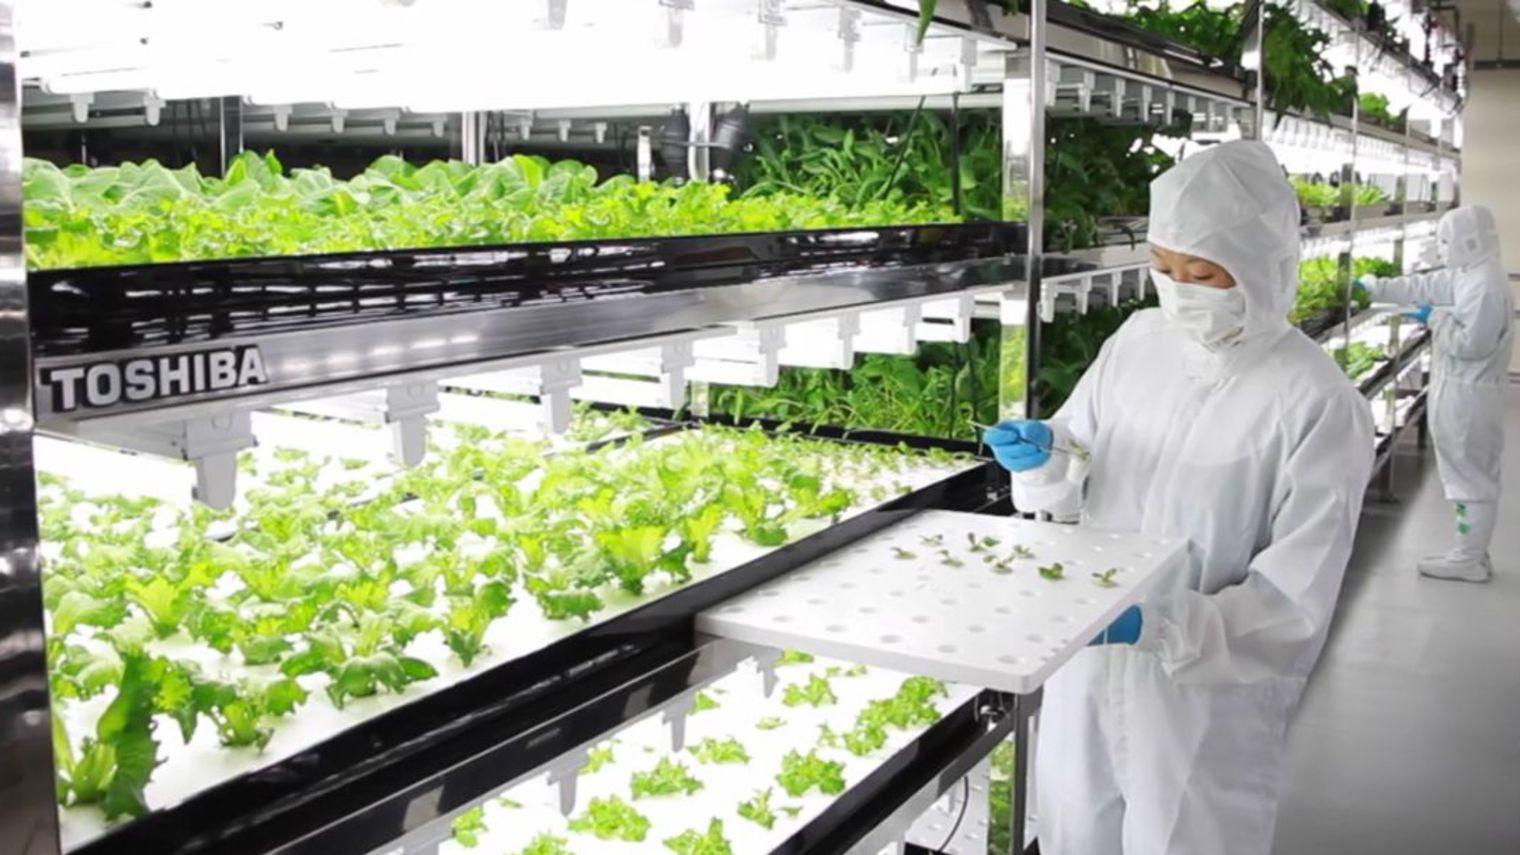 laboratoire-de-salade-toshiba-a-yokosuka